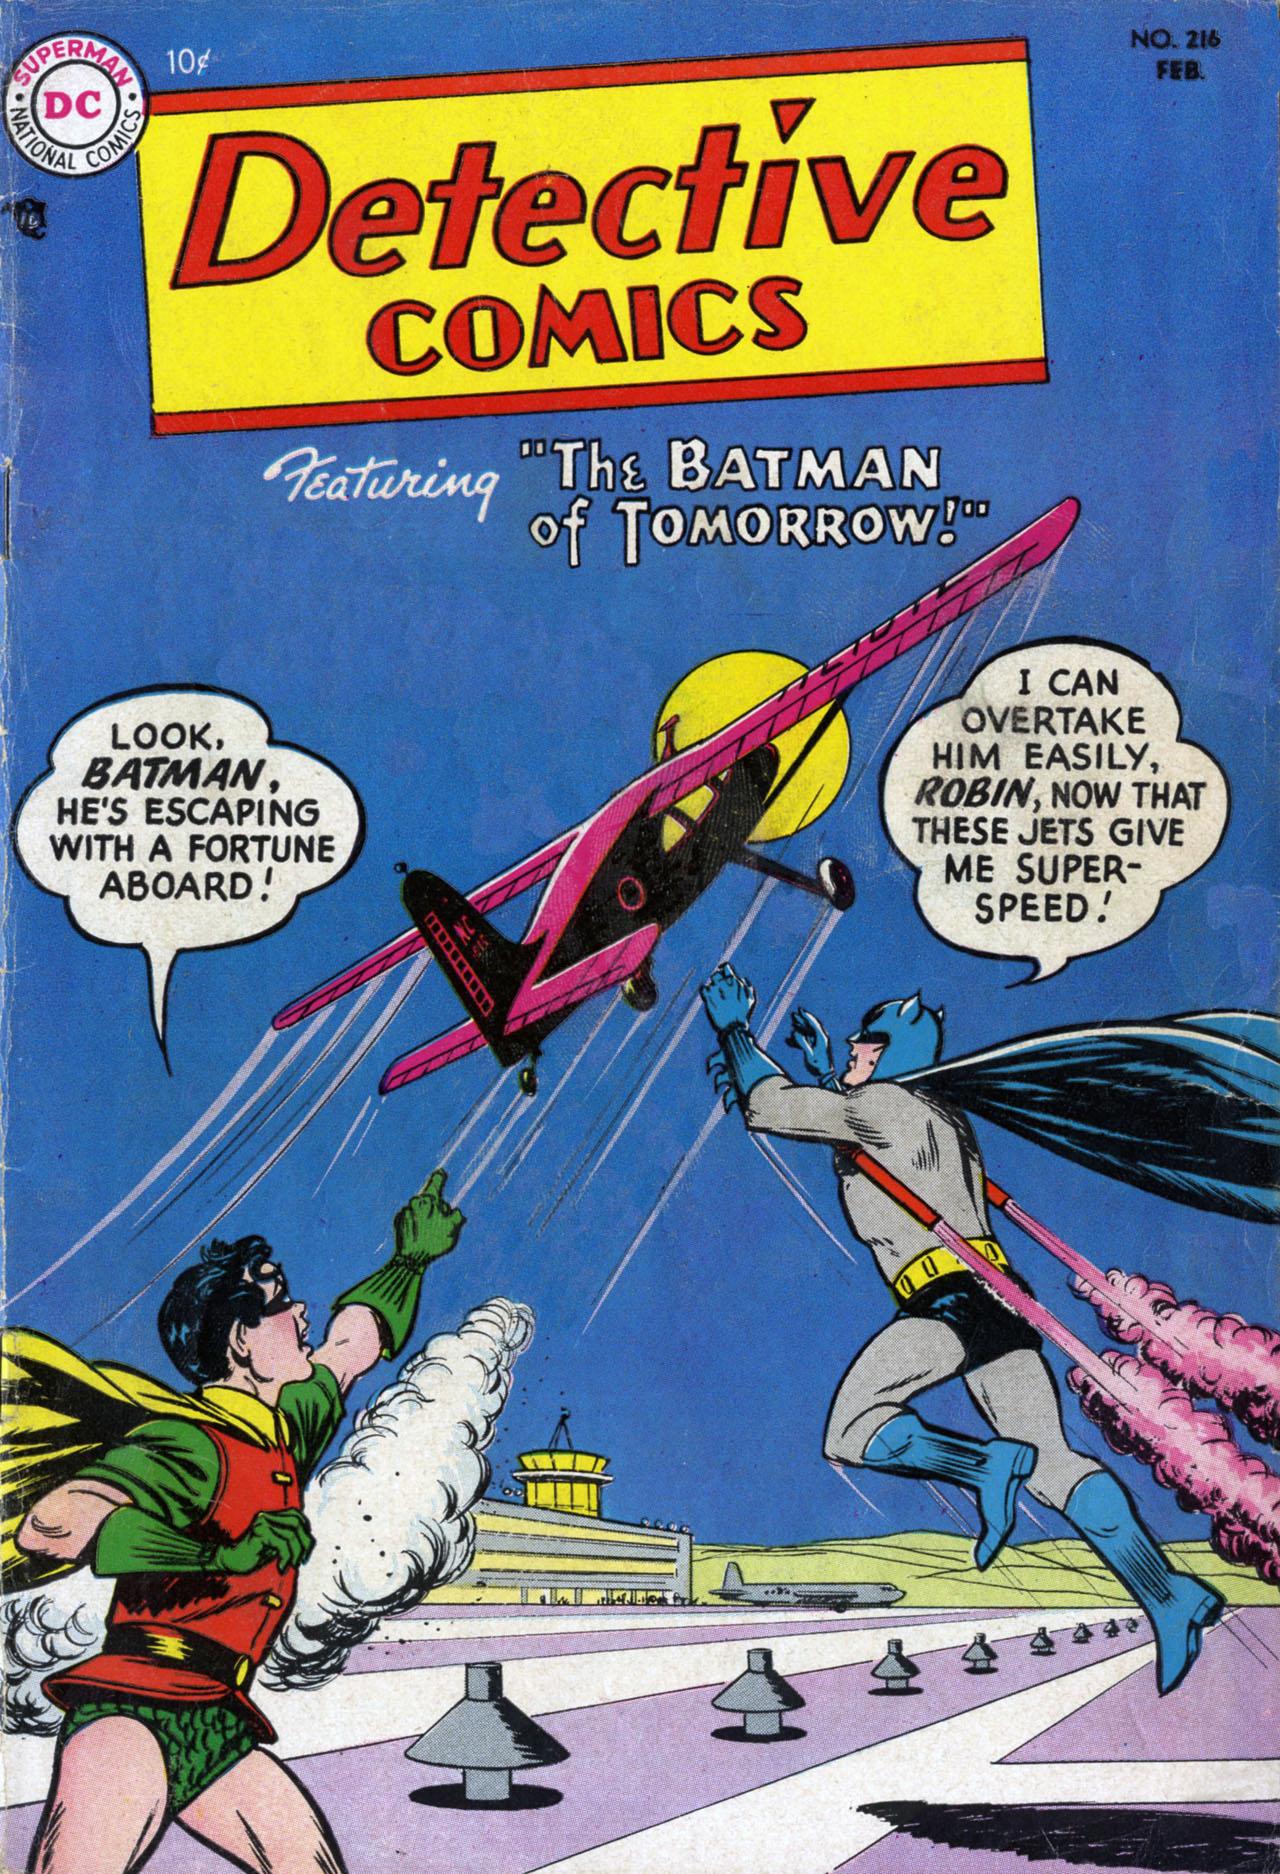 Detective Comics (1937) 216 Page 1